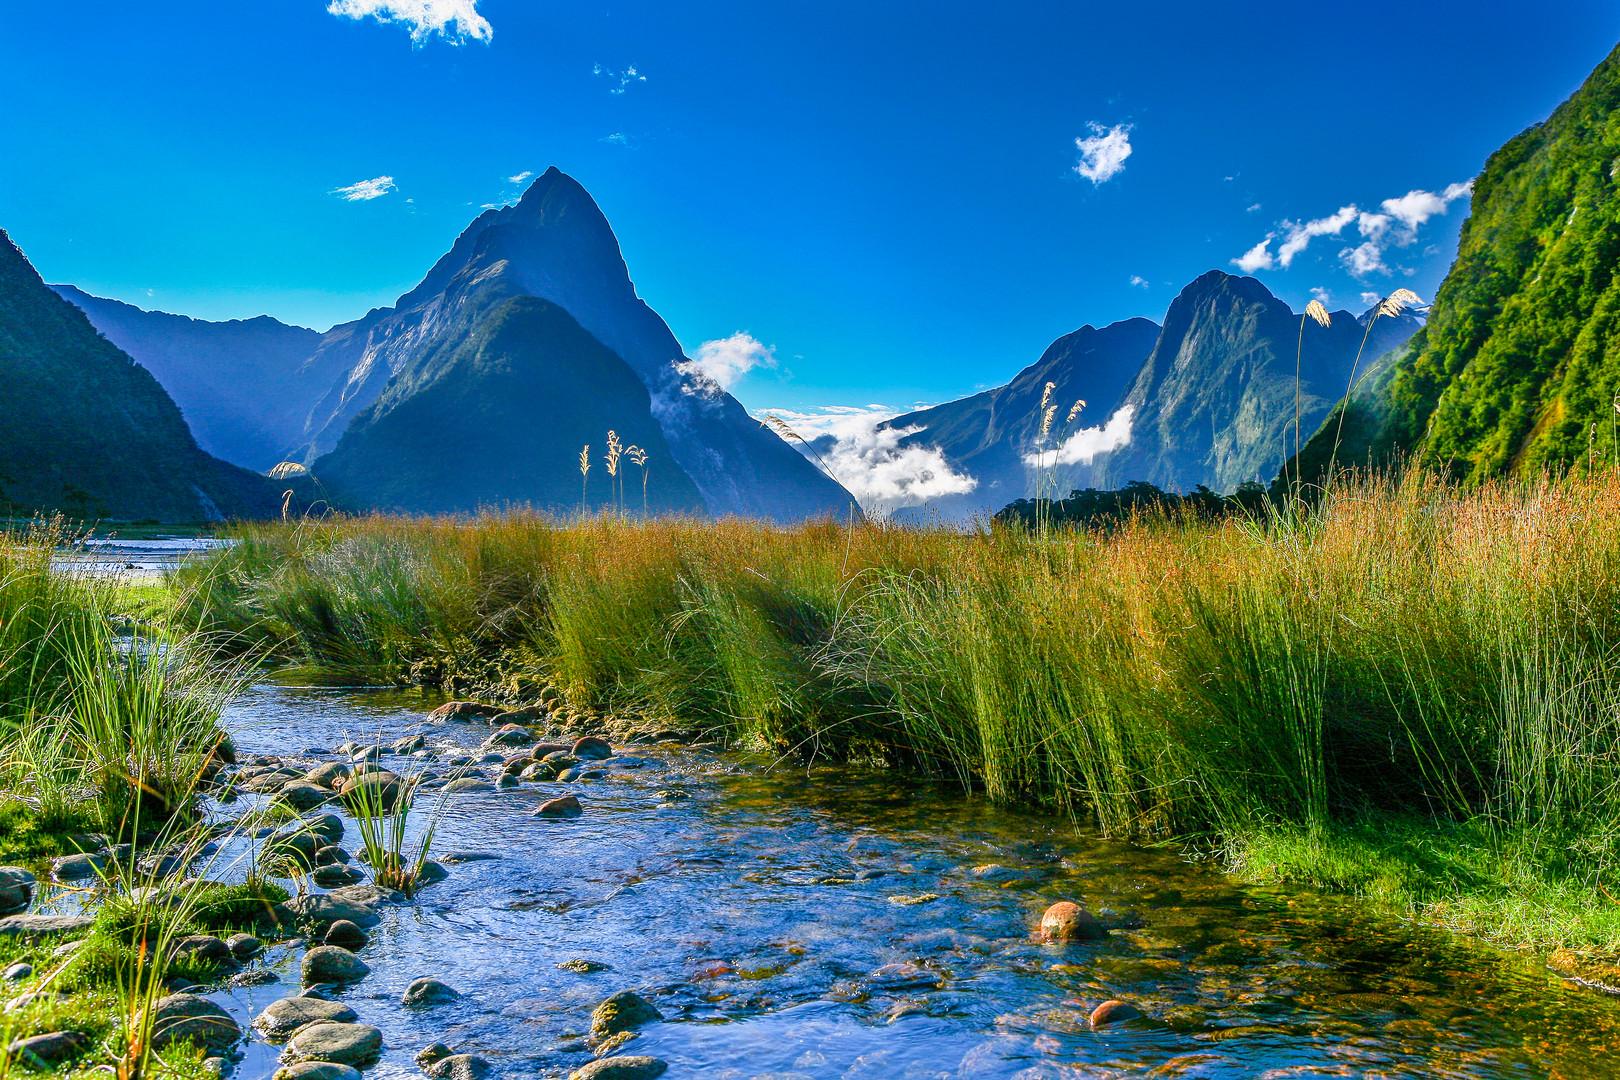 Video Neuseeland Pinterest: Milford Sound Neuseeland Foto & Bild